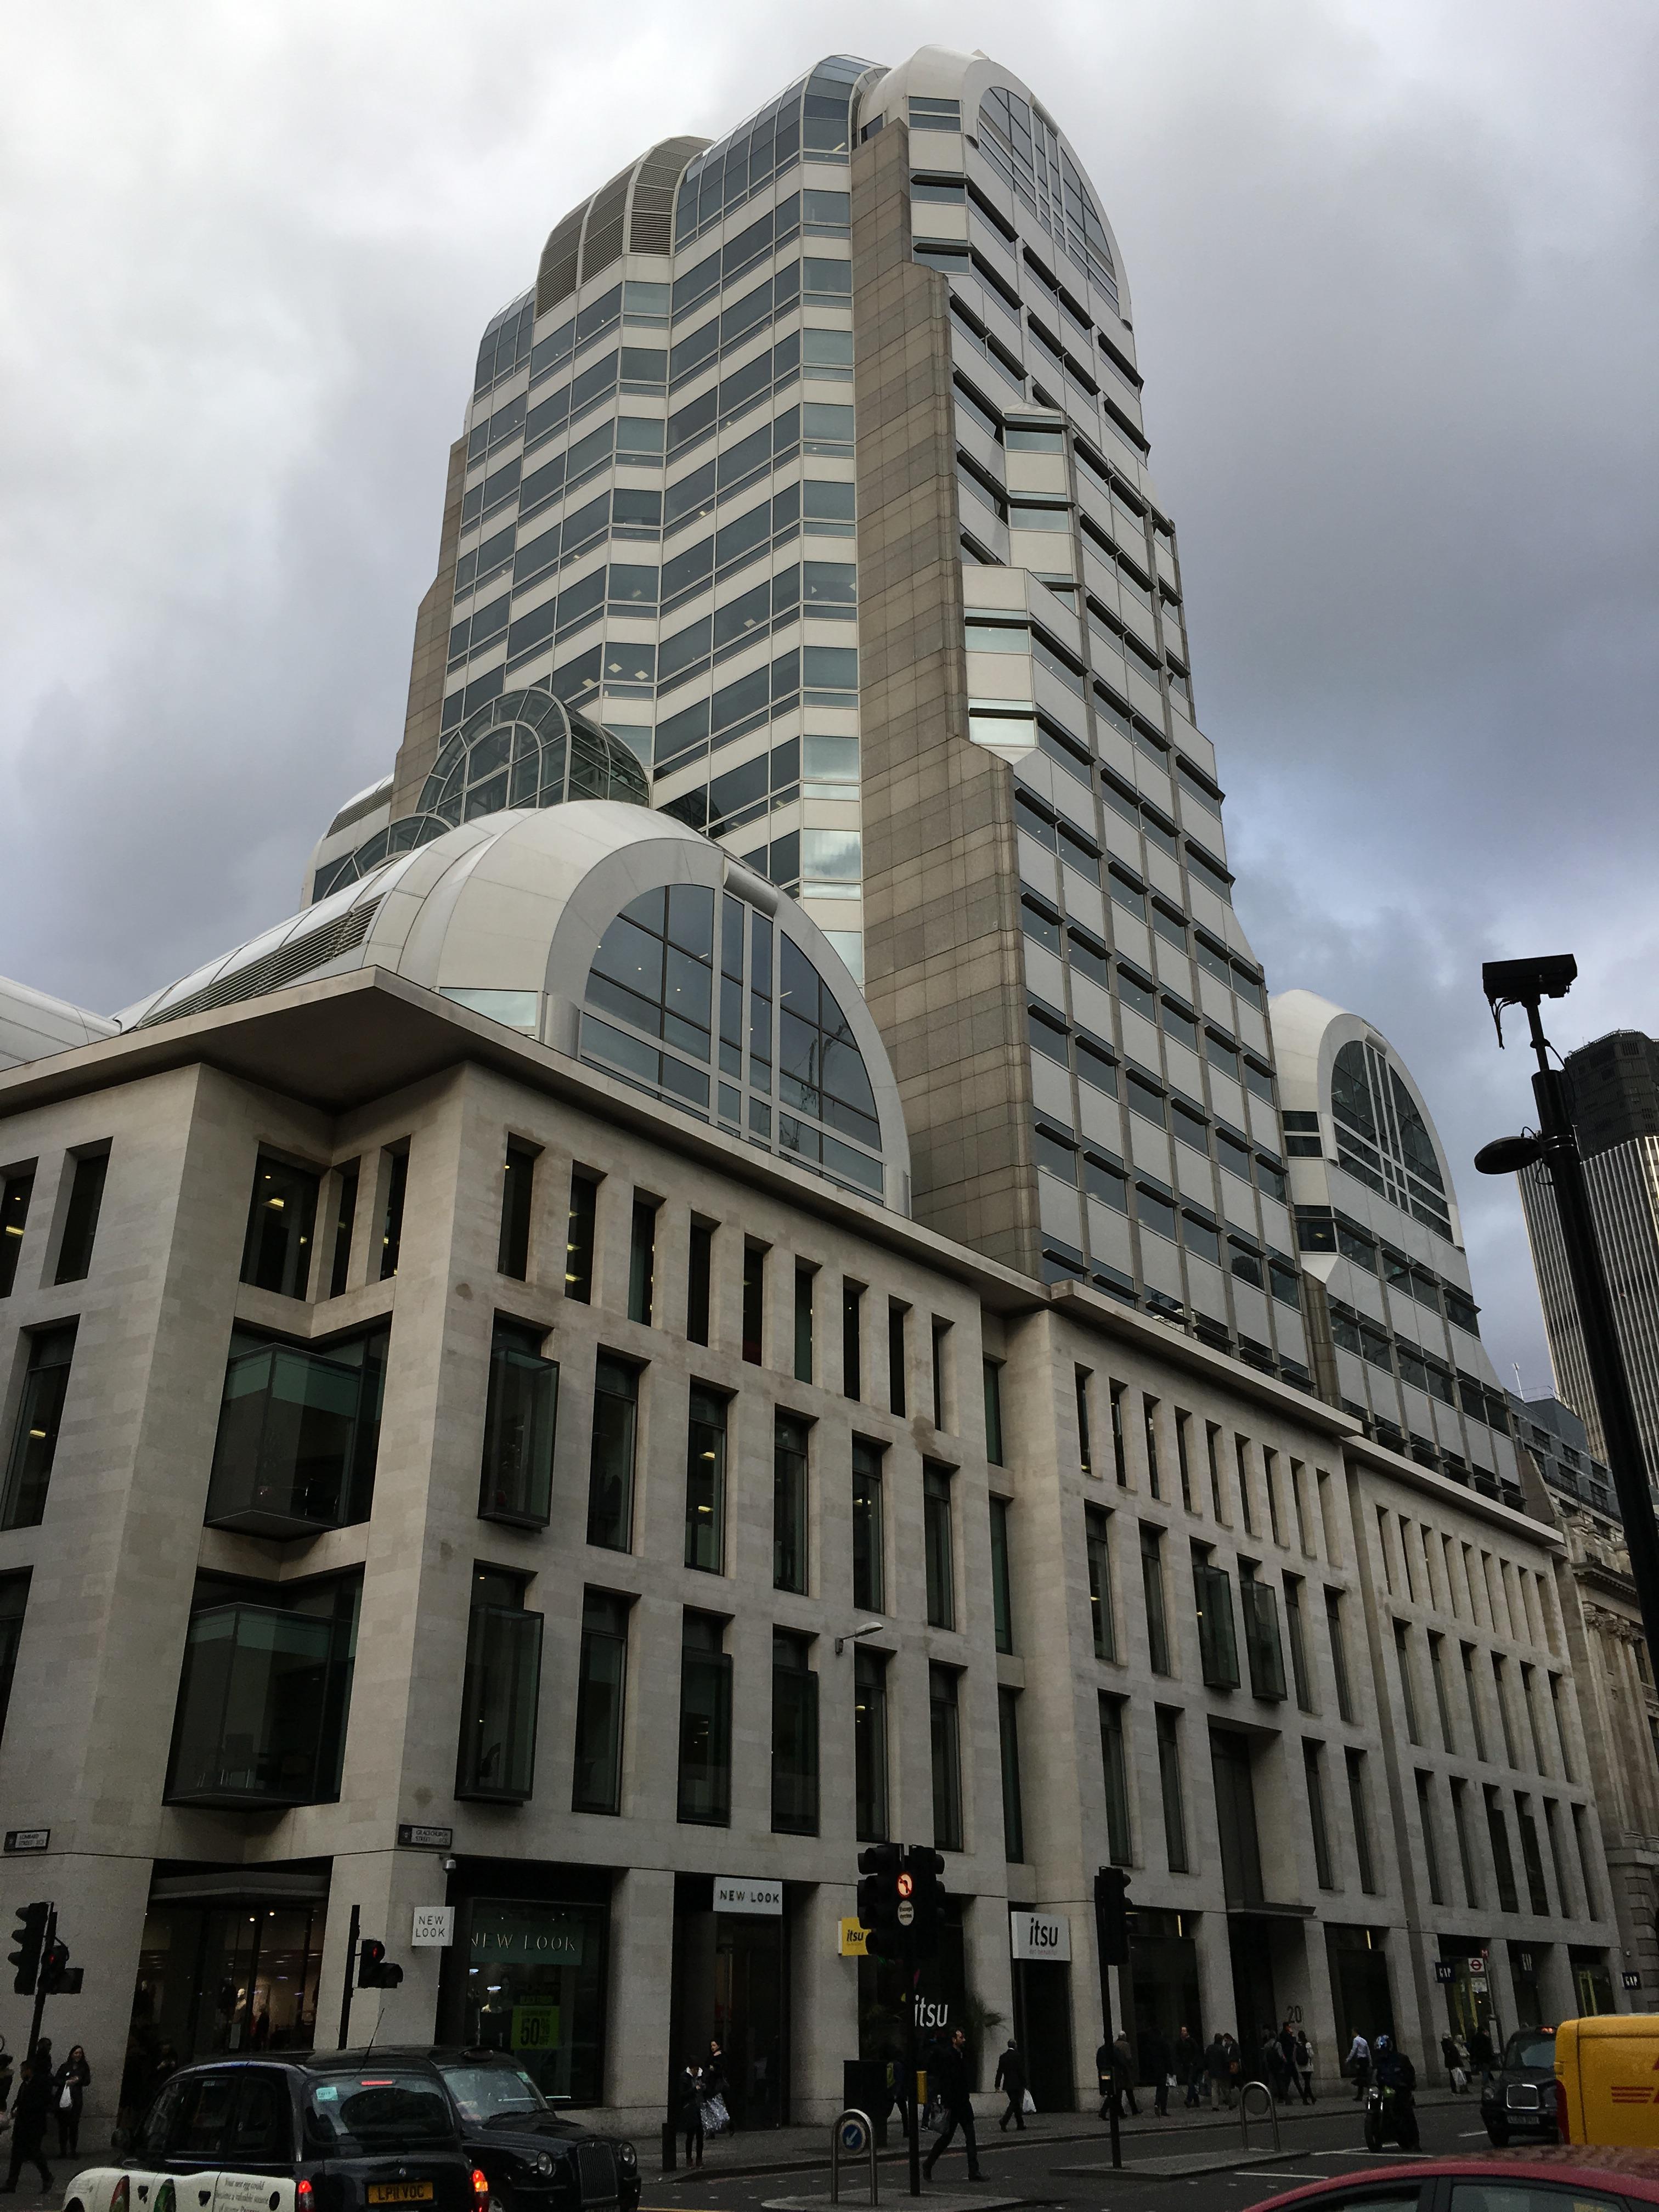 Main photo of 20 Gracechurch Street